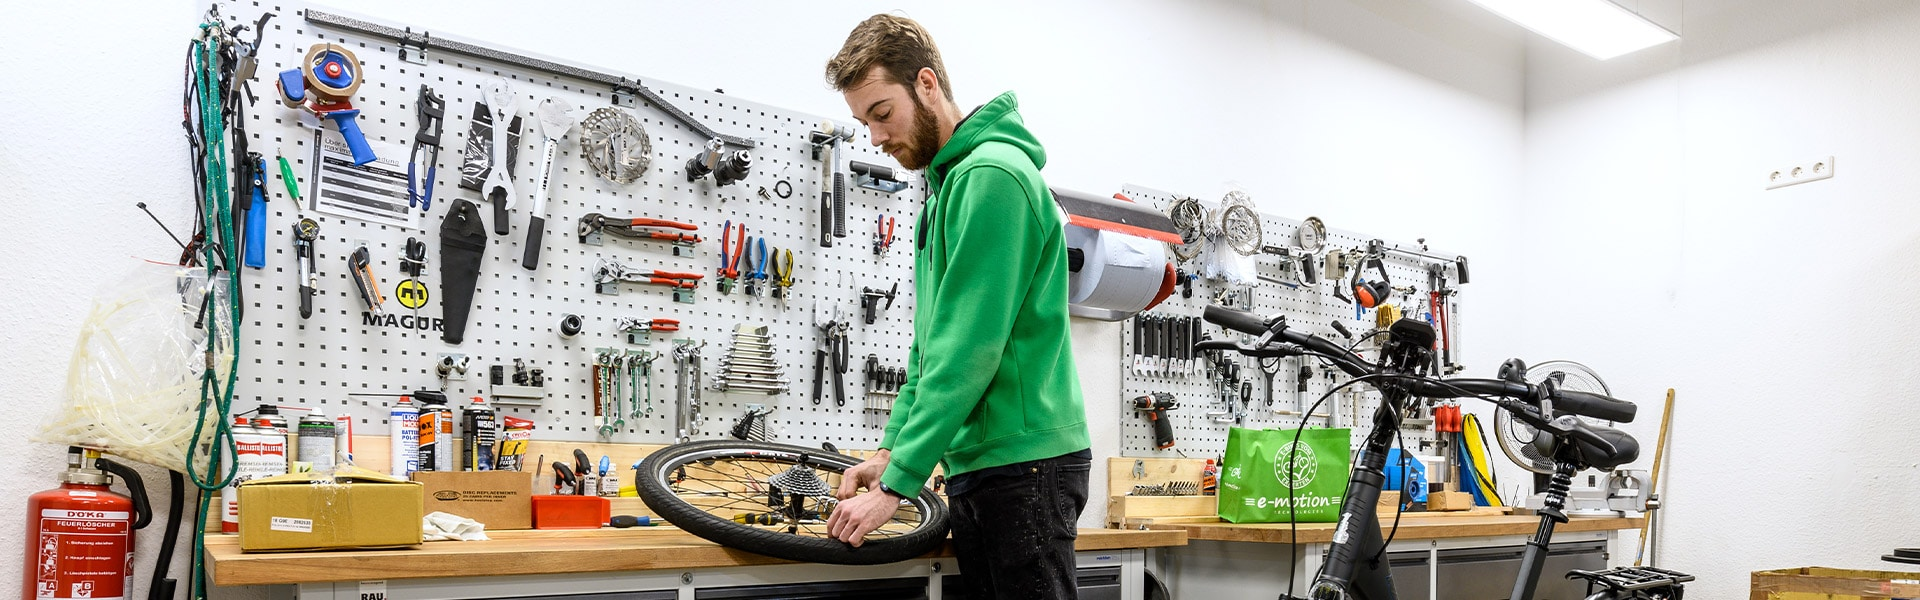 Die Werkstatt der e-motion e-Bike Welt Bochum